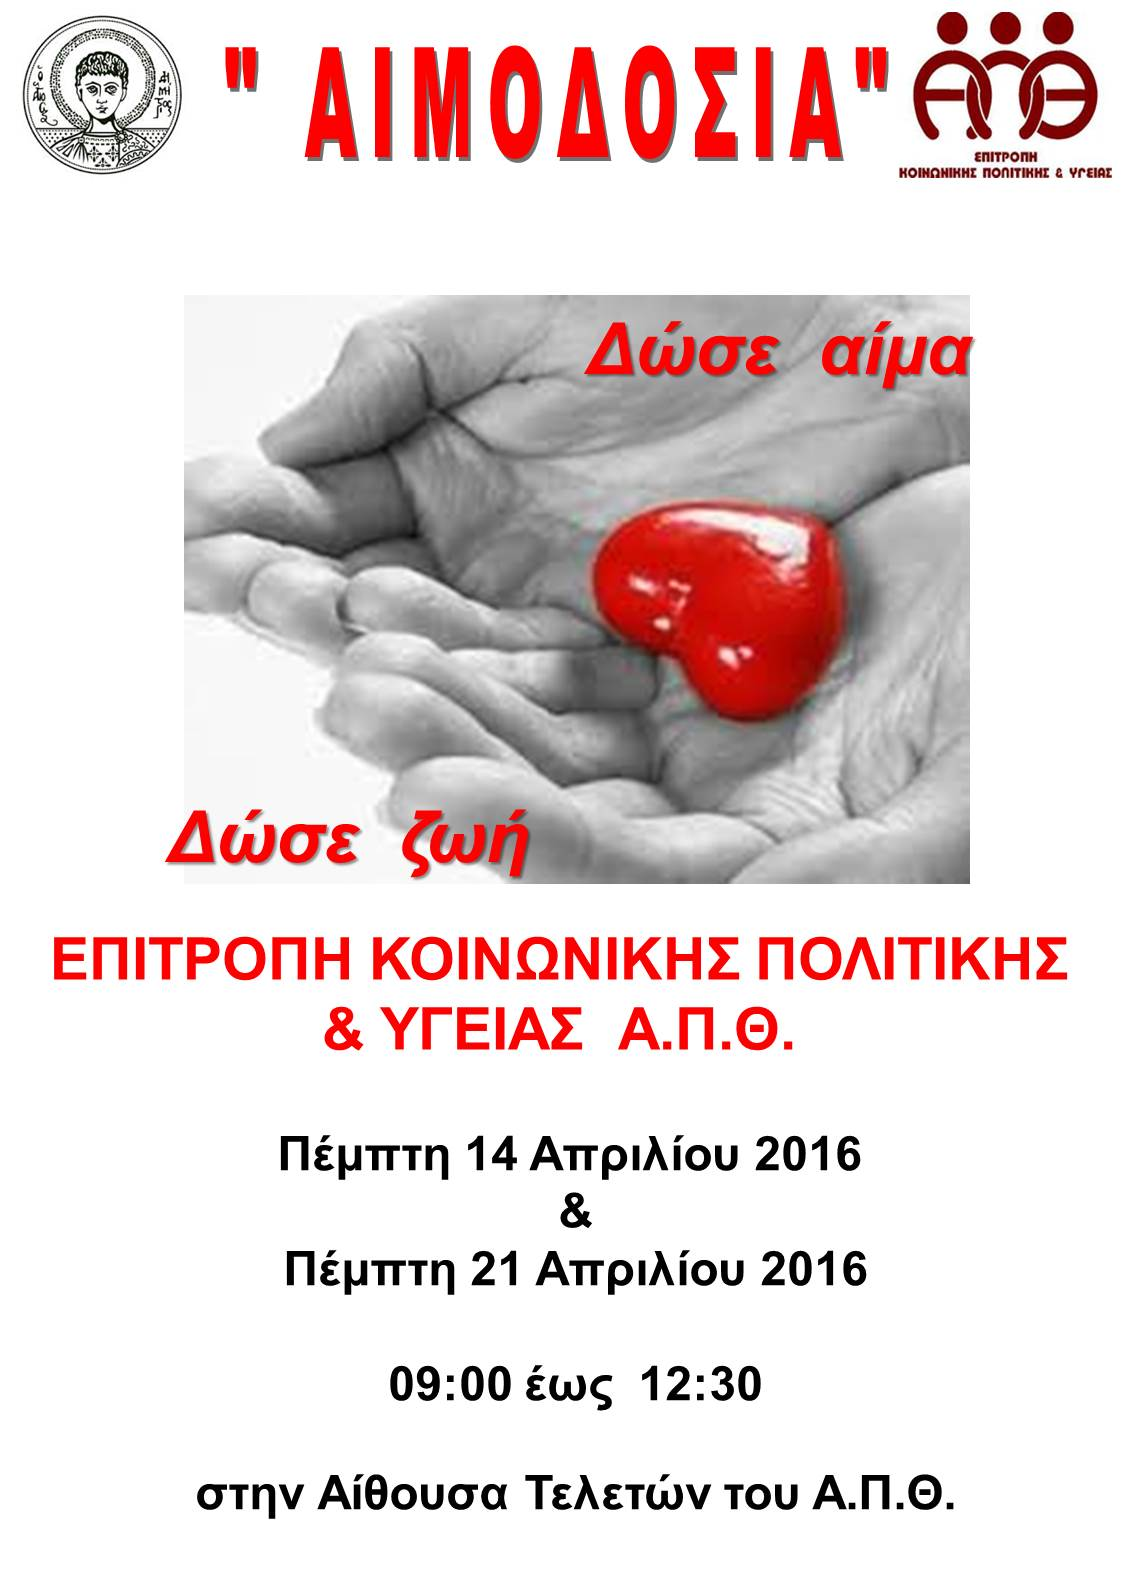 afisa aimodosias aprilios 2016